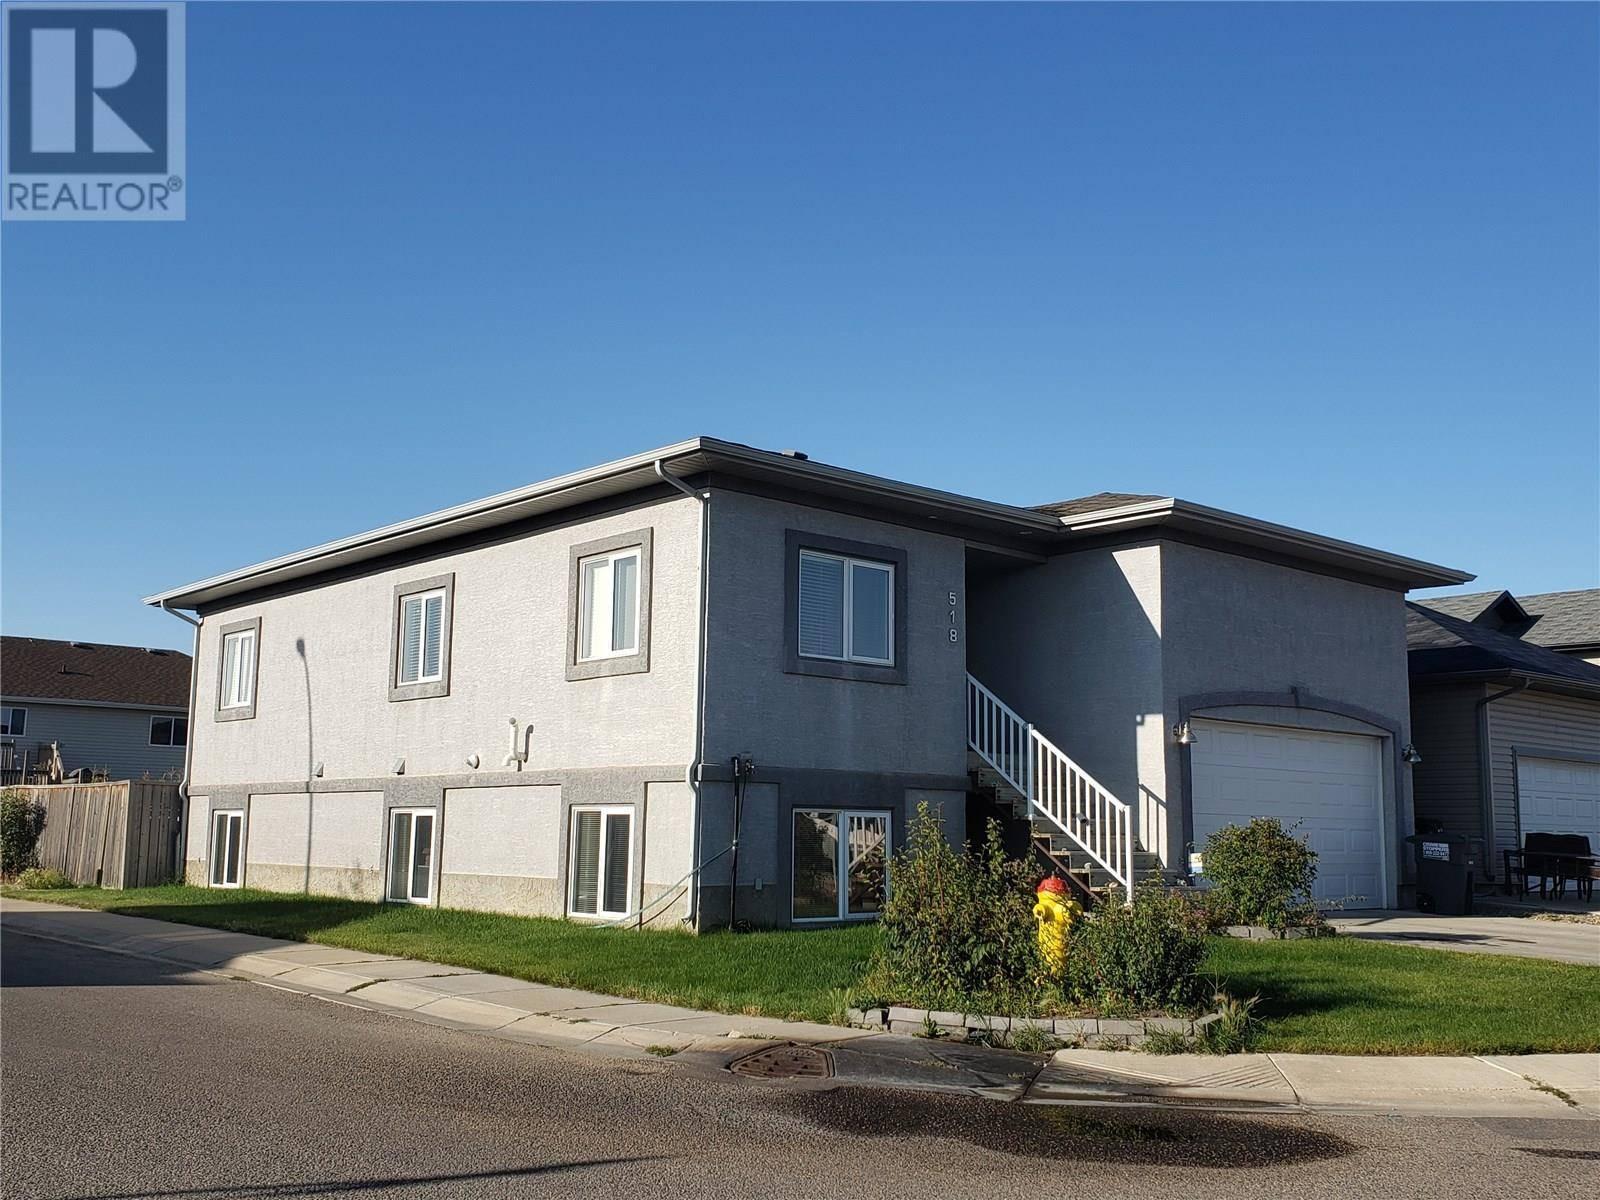 House for sale at 518 Mckague Cres Saskatoon Saskatchewan - MLS: SK785017